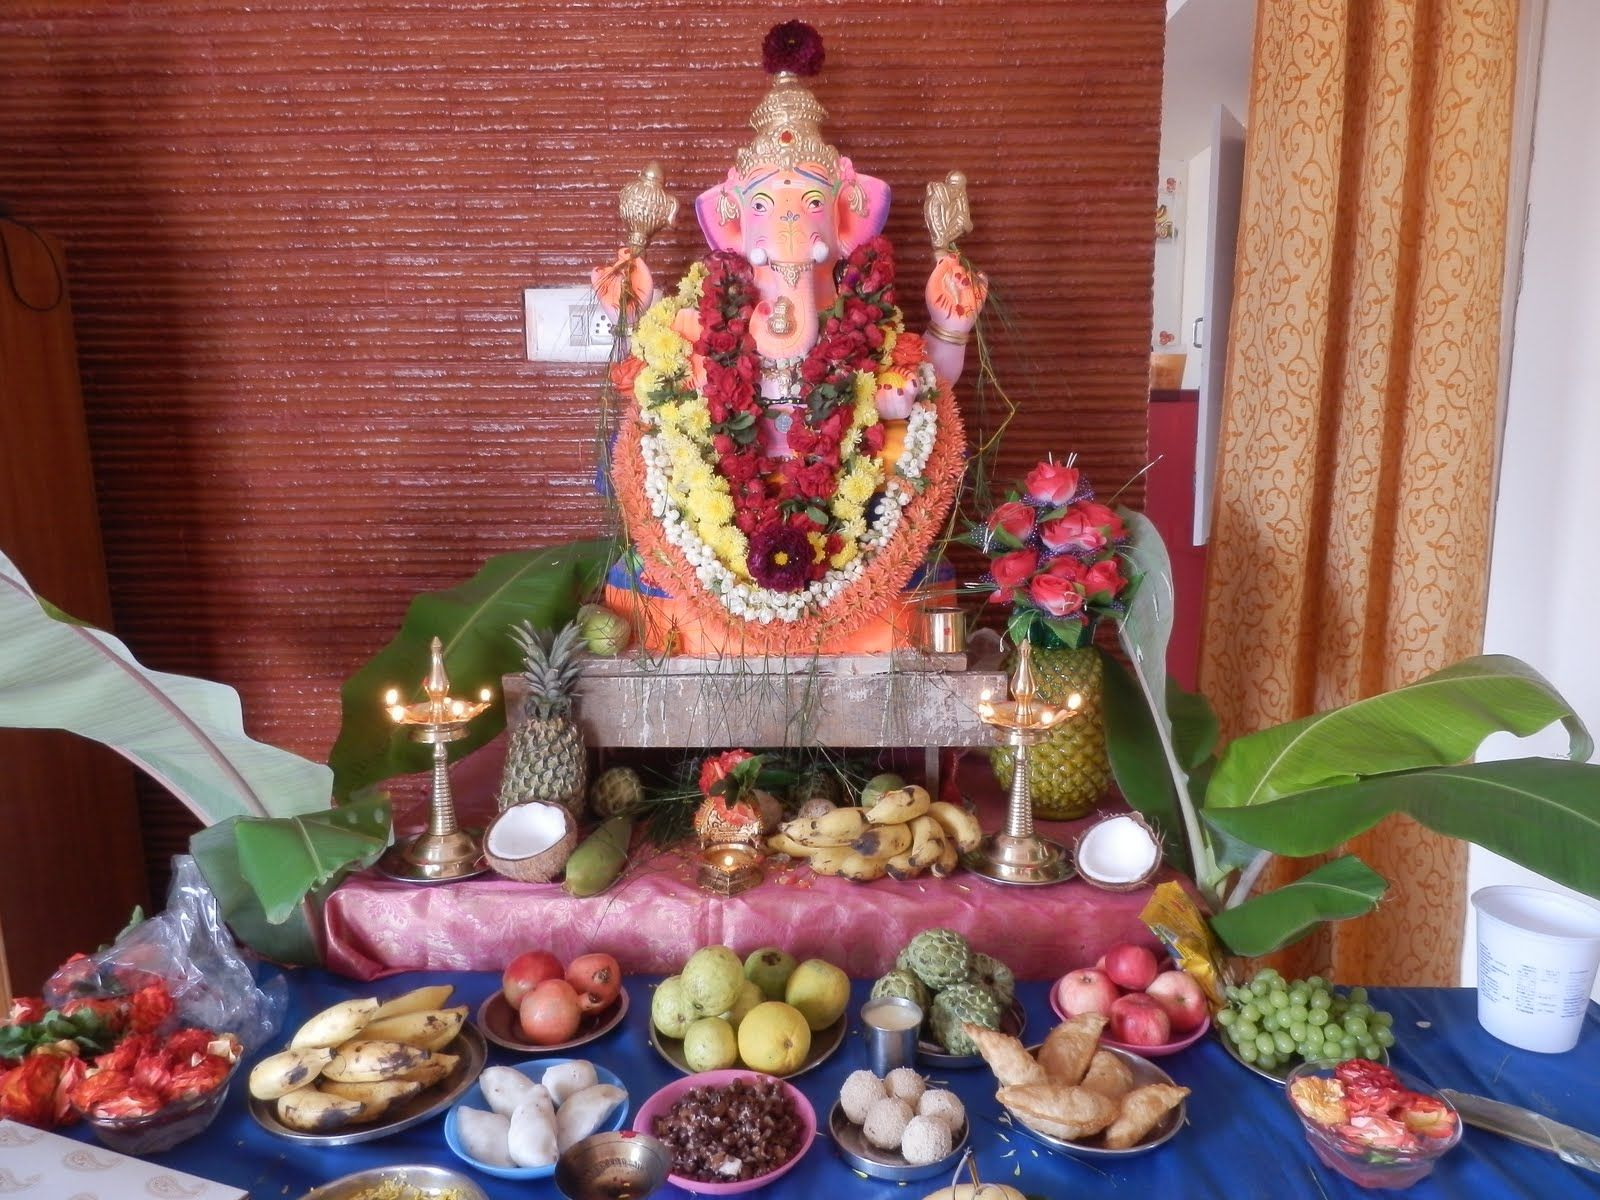 vinayaka chaturthi home decoration   Ganesha, Ganesh, Festival